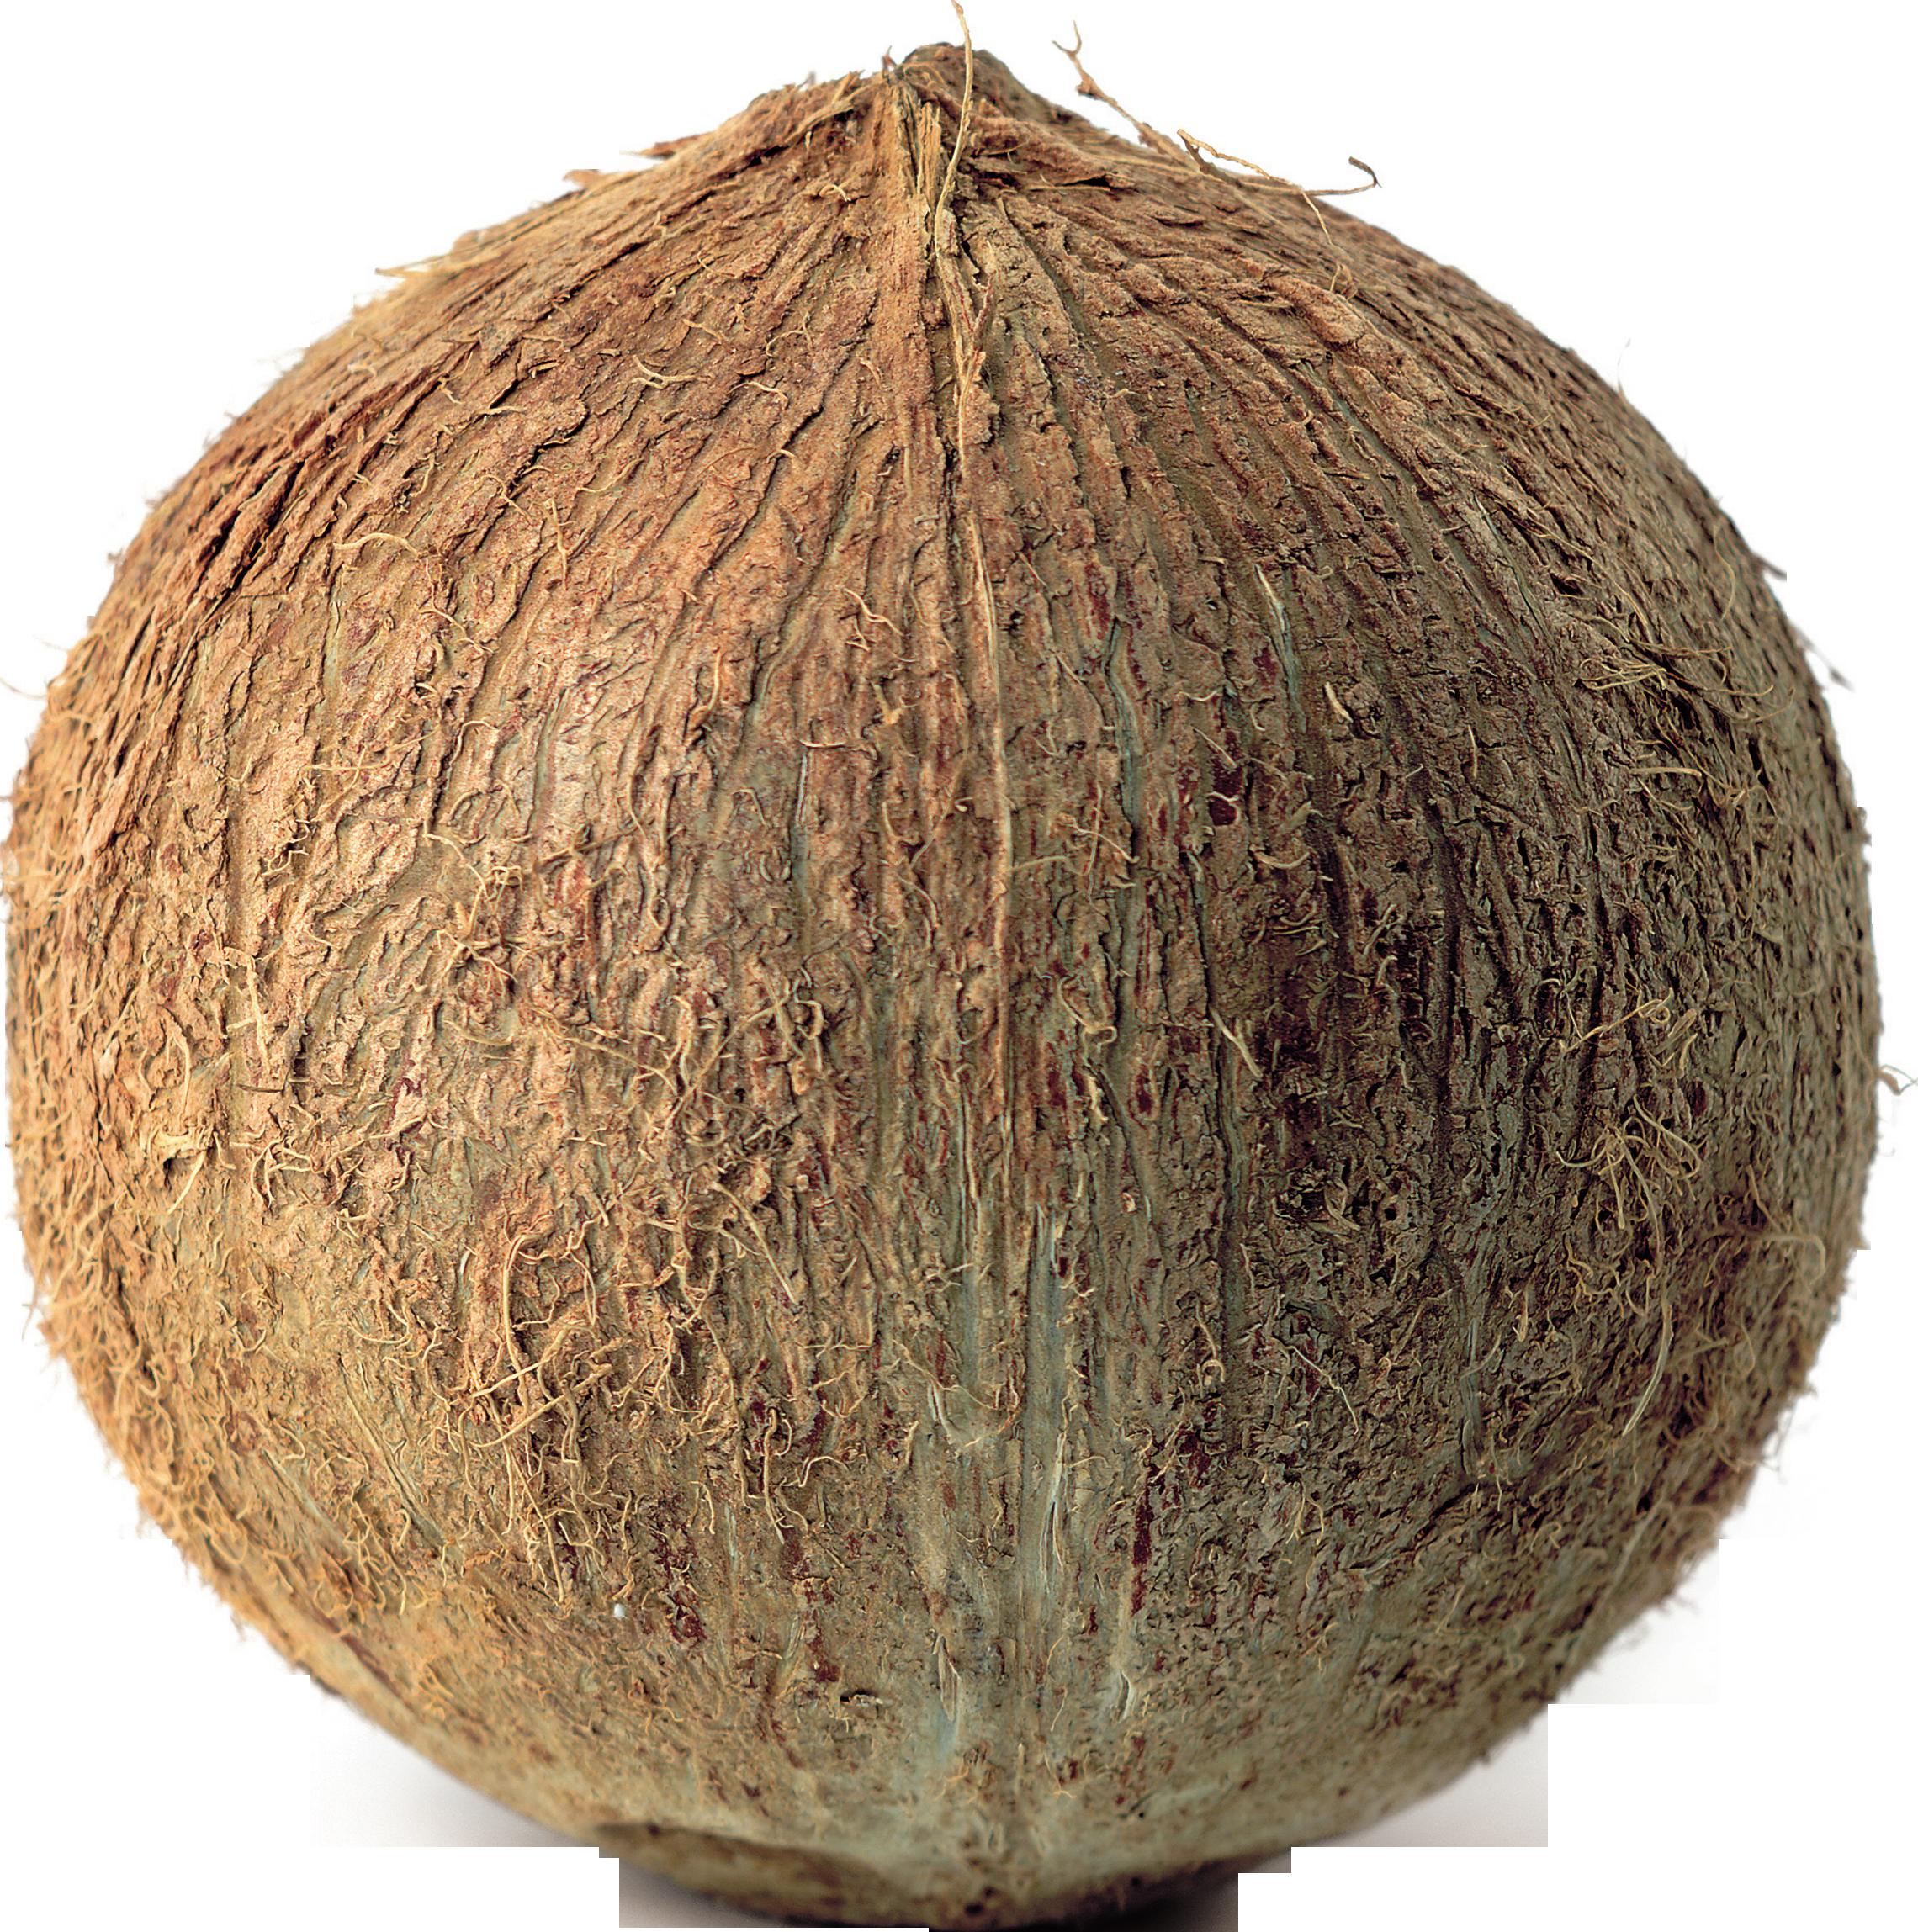 banner freeuse download Coconut PNG Image